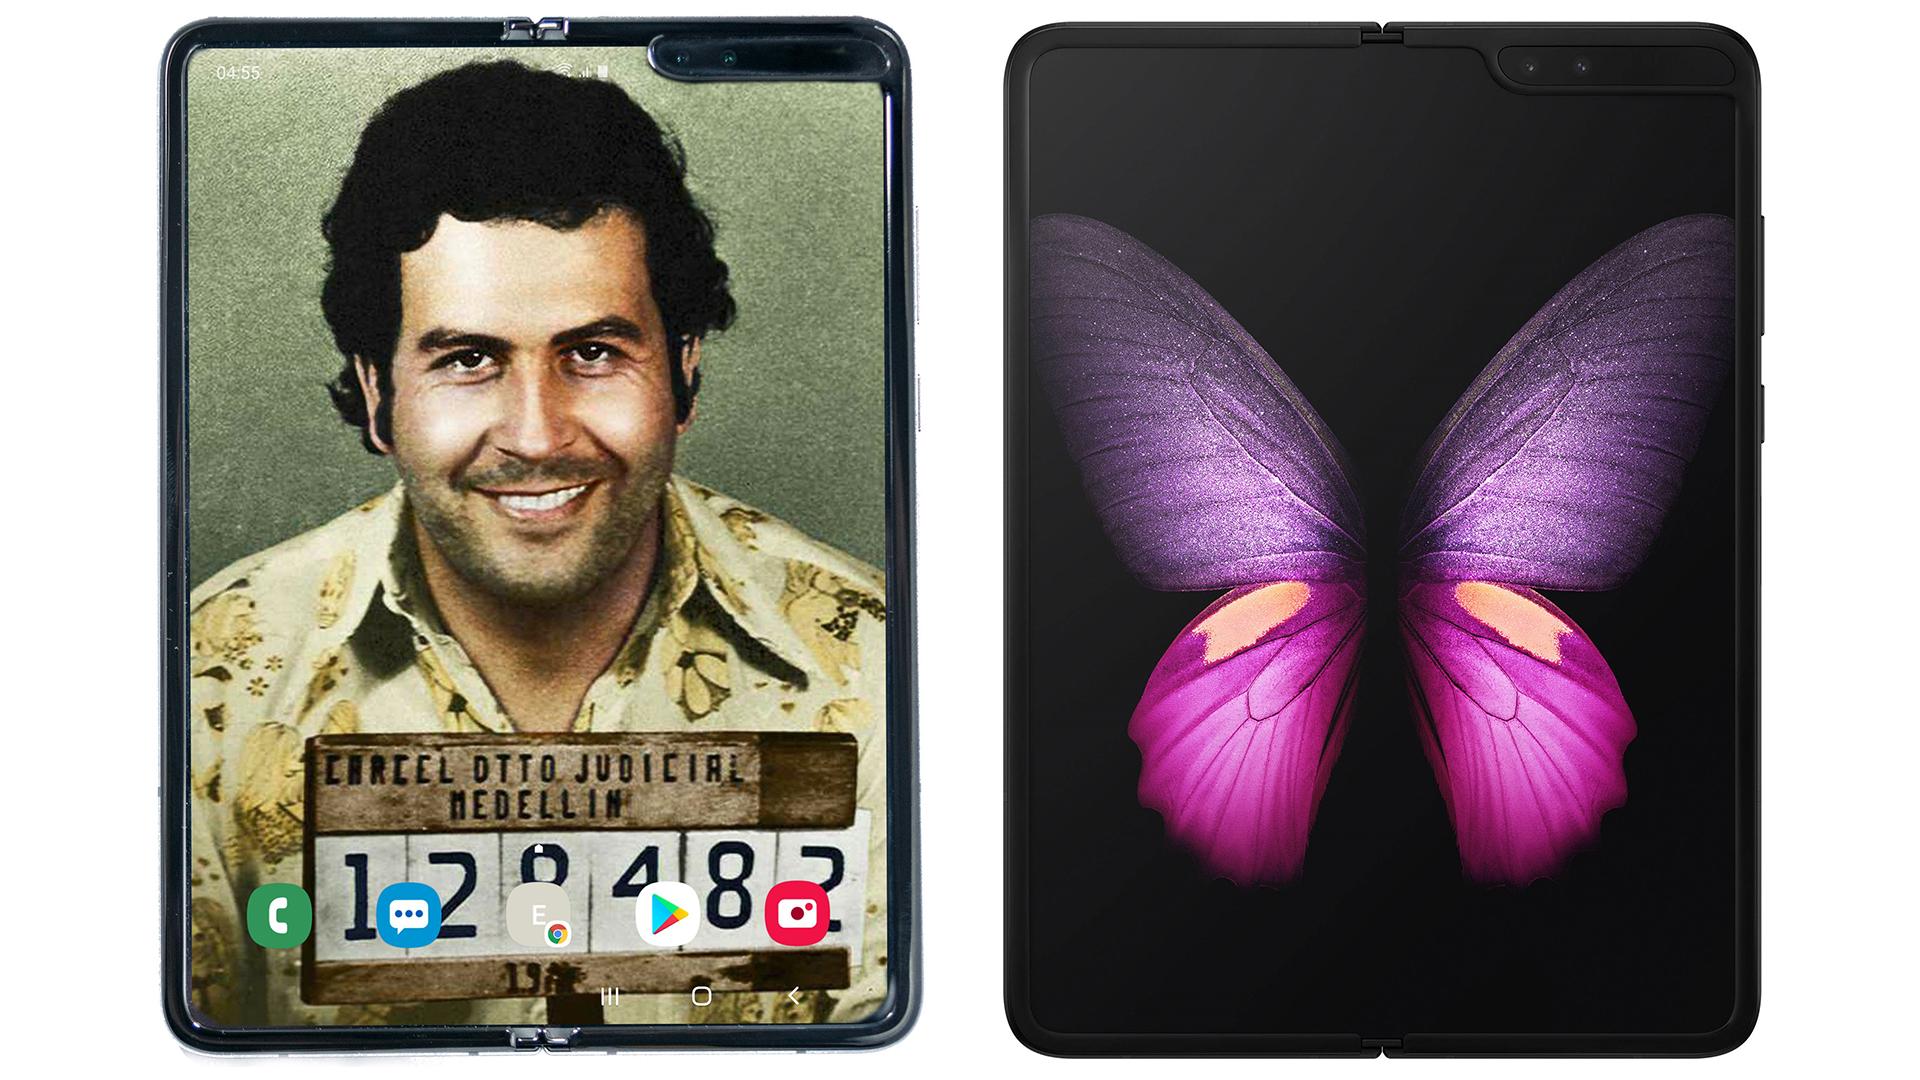 Escobar Fold 2 Next to Samsung Galaxy Fold